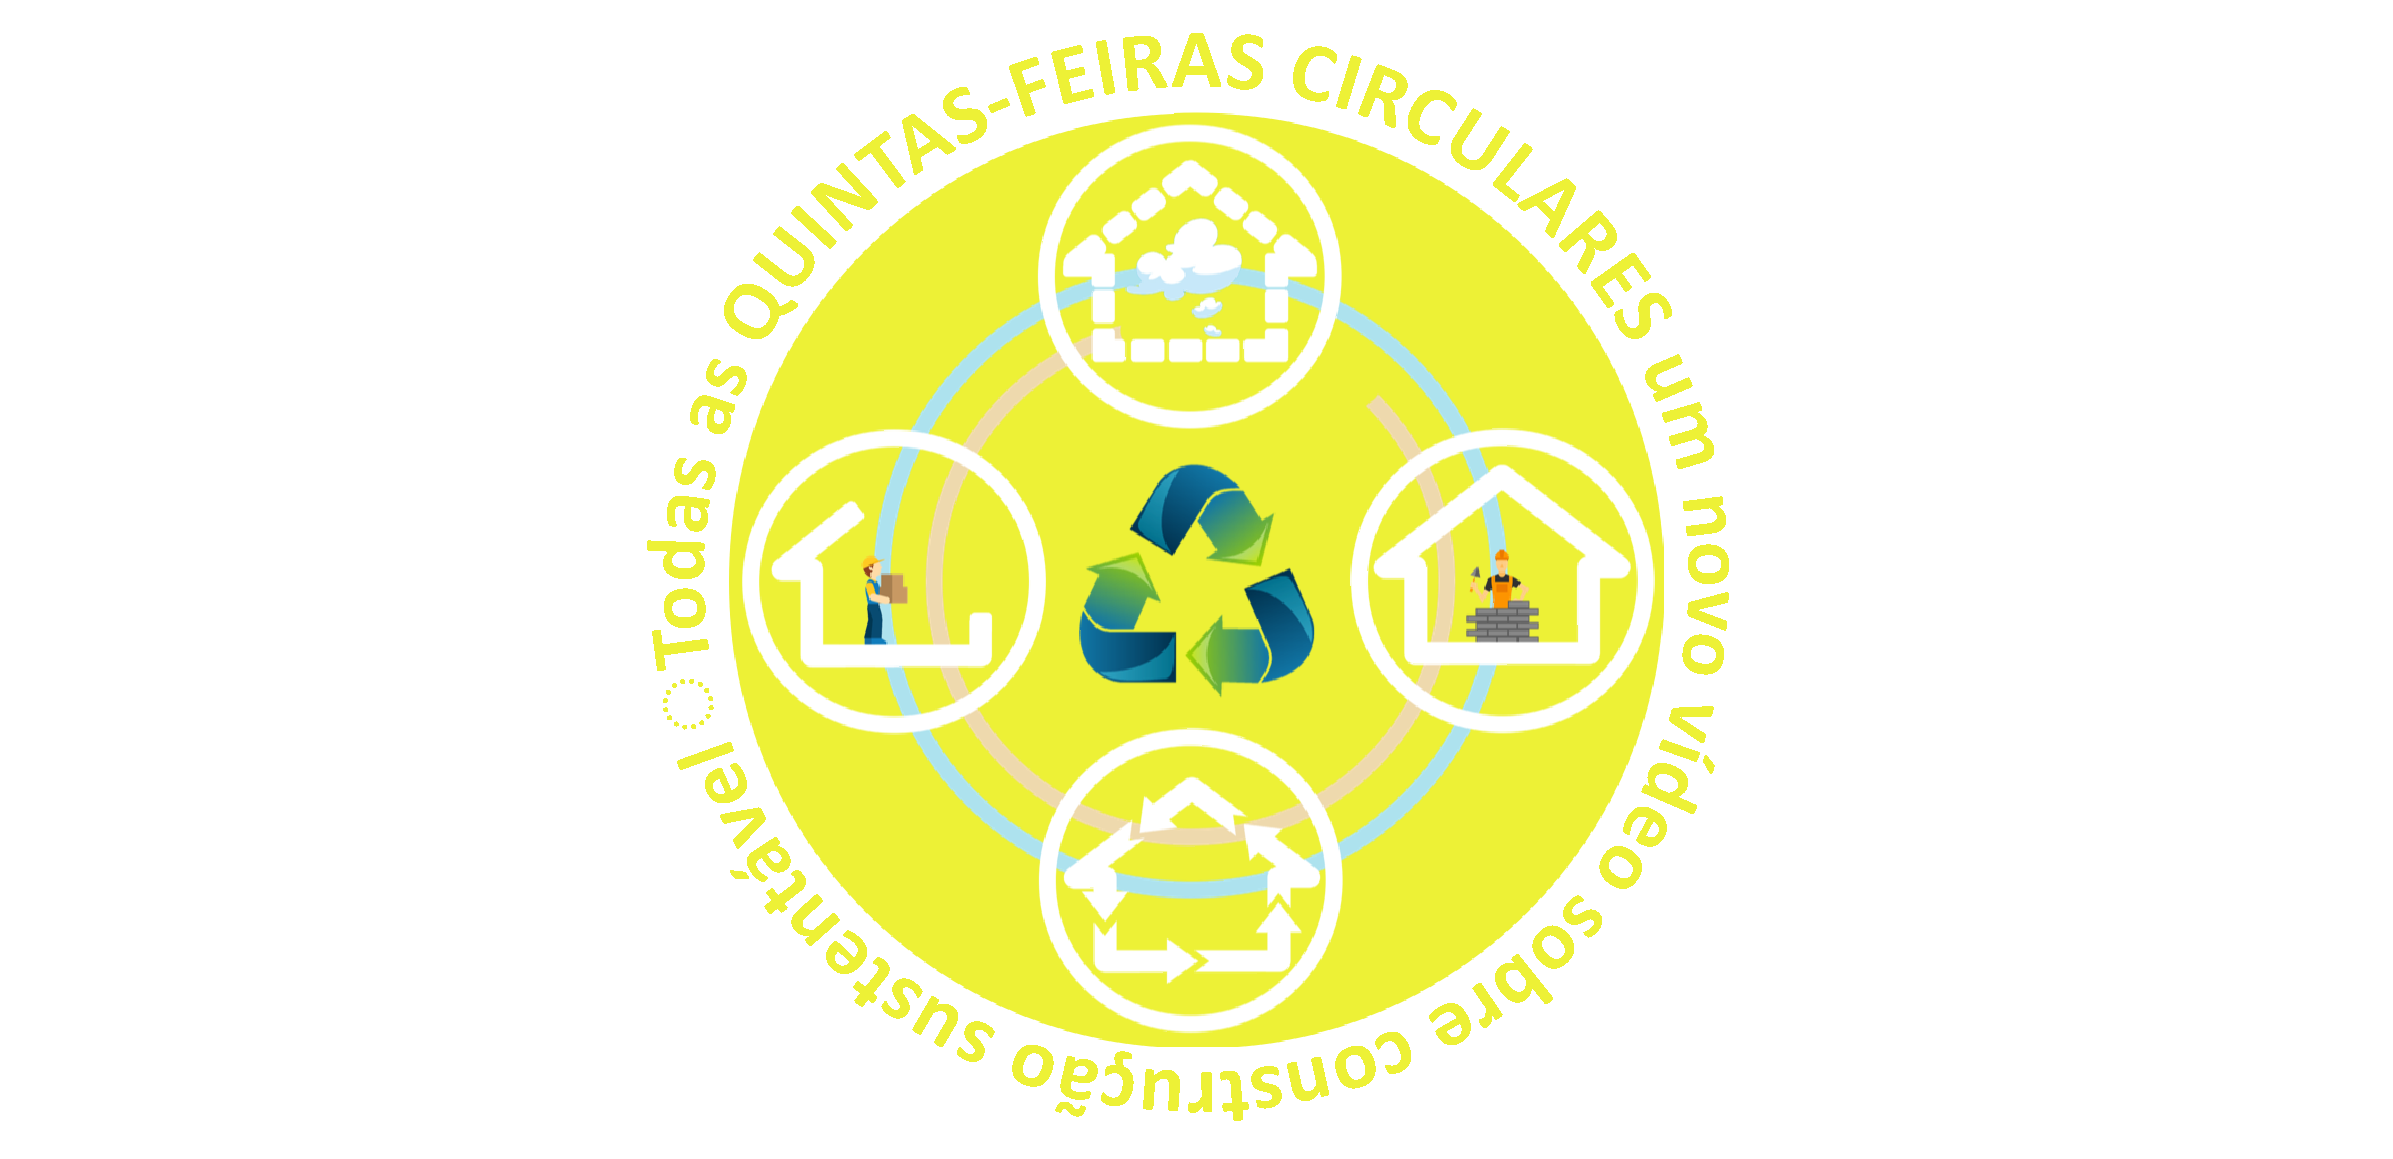 QUINTA(S)-FEIRA(S) (A) CIRCULAR(ES)!